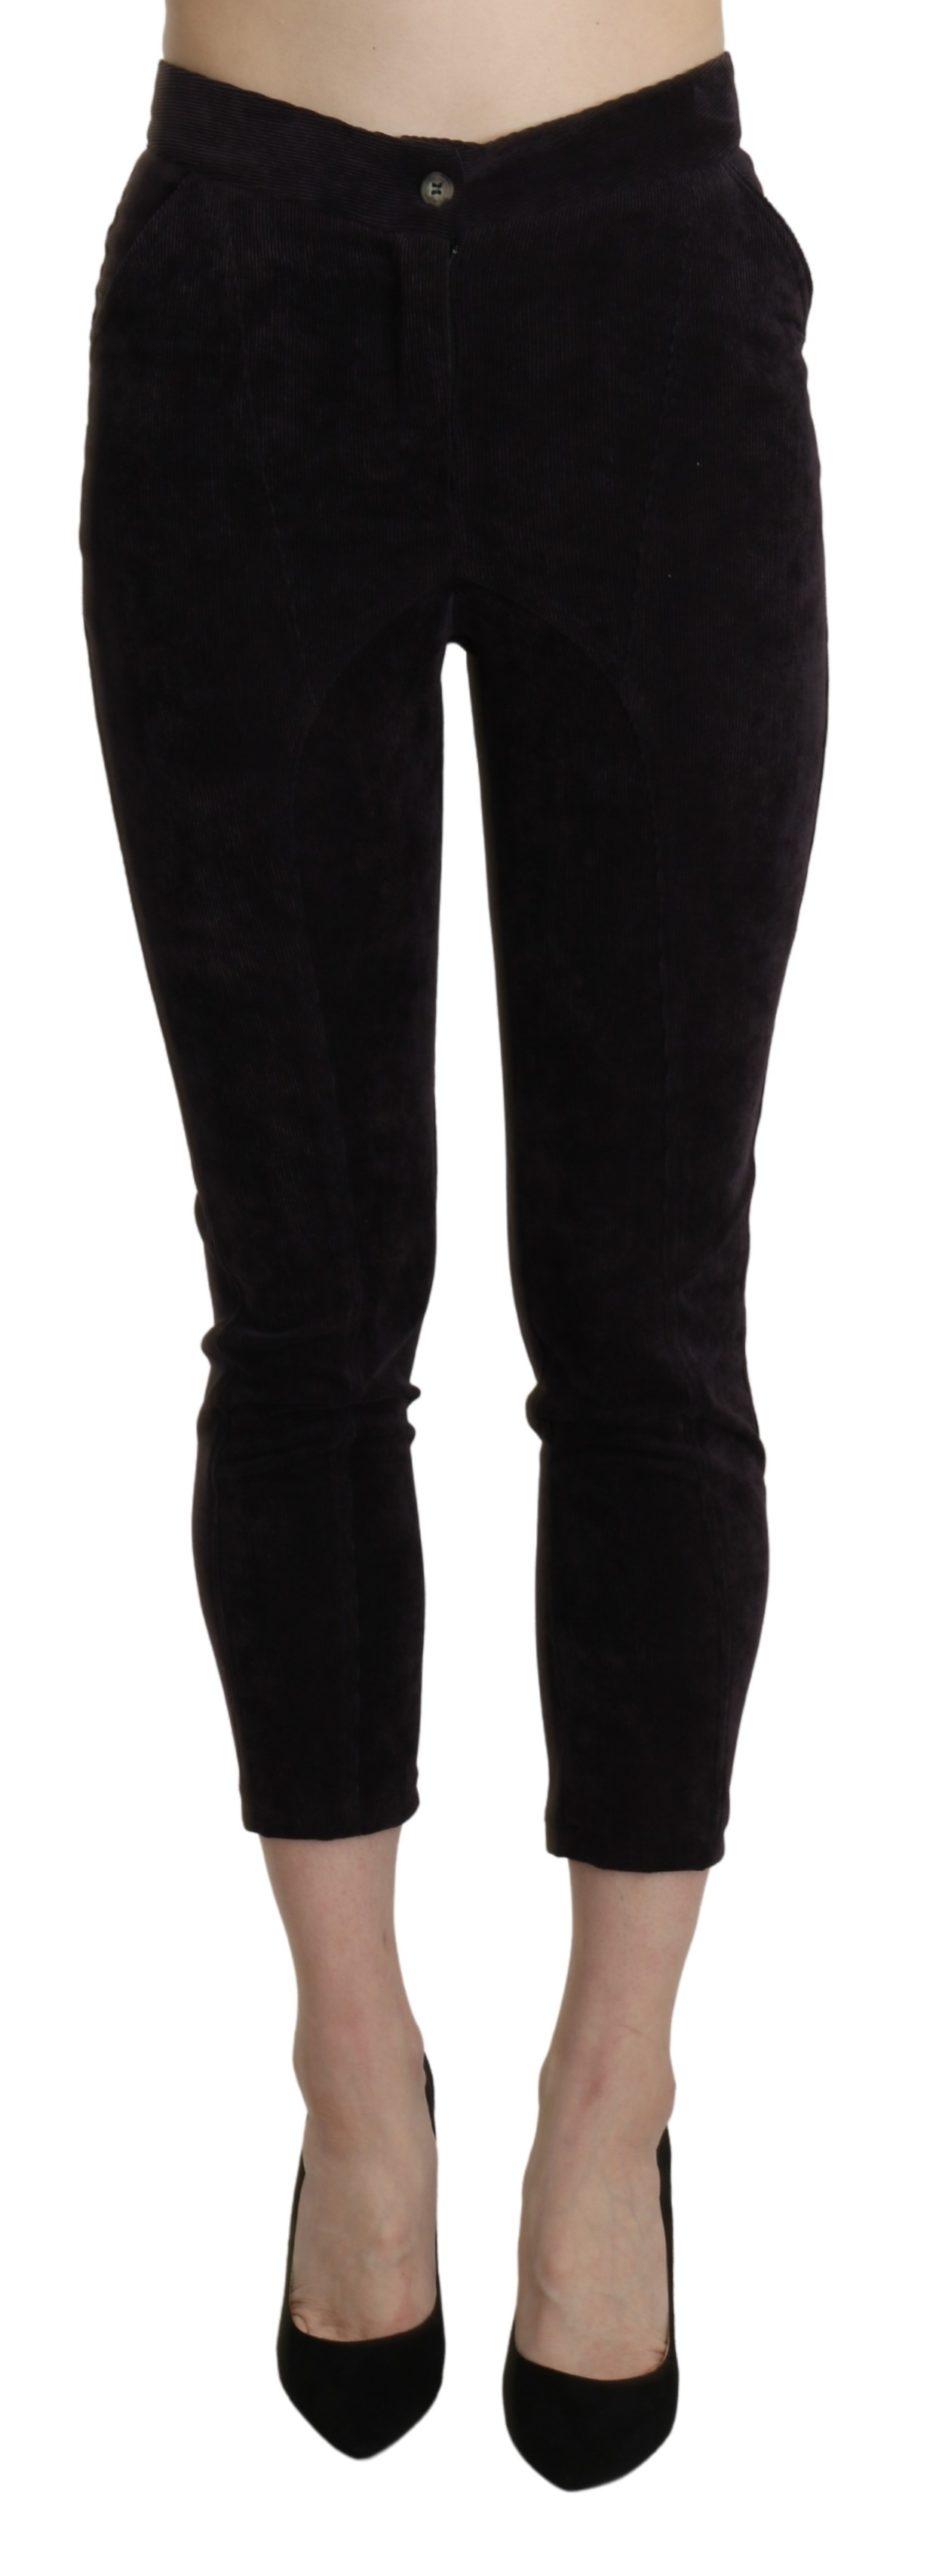 BENCIVENGA Women's High Waist Skinny Cropped Trousers Brown PAN71356-40 - IT40|S